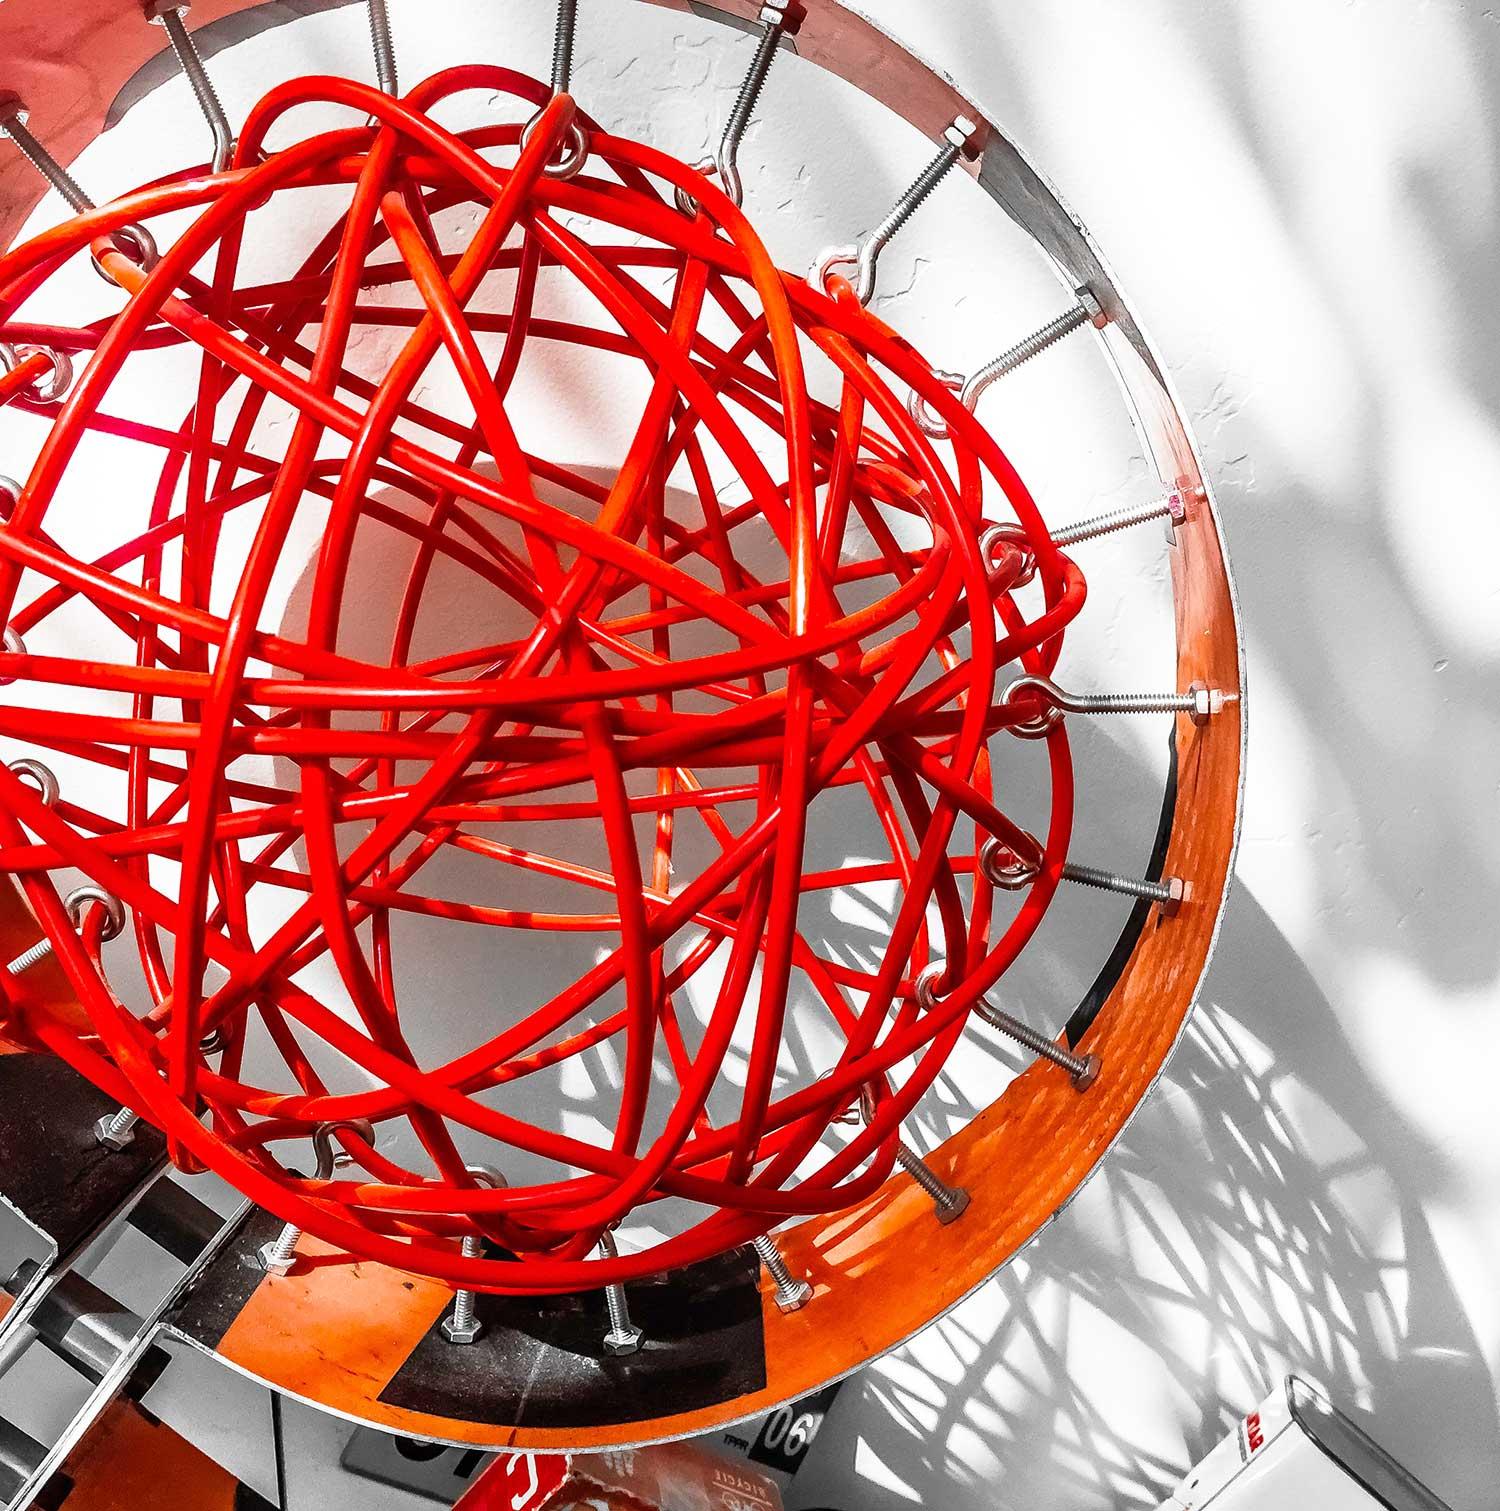 ron-miriello-grafico-san-diego-100-worlds-project-sculpture-globe-Miriello-branding-officina-05.jpg